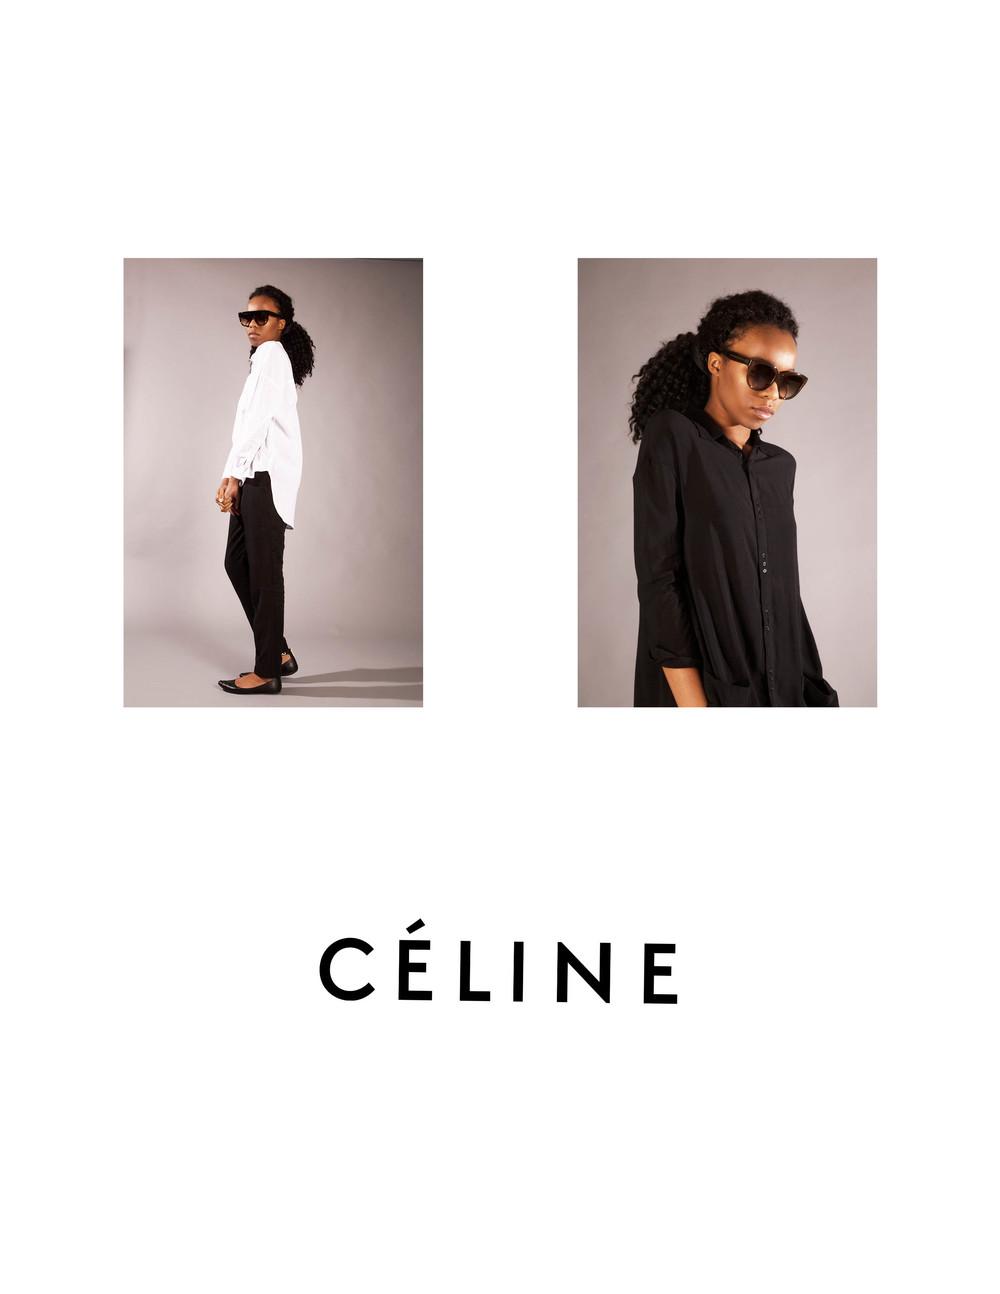 Celine_01.jpg